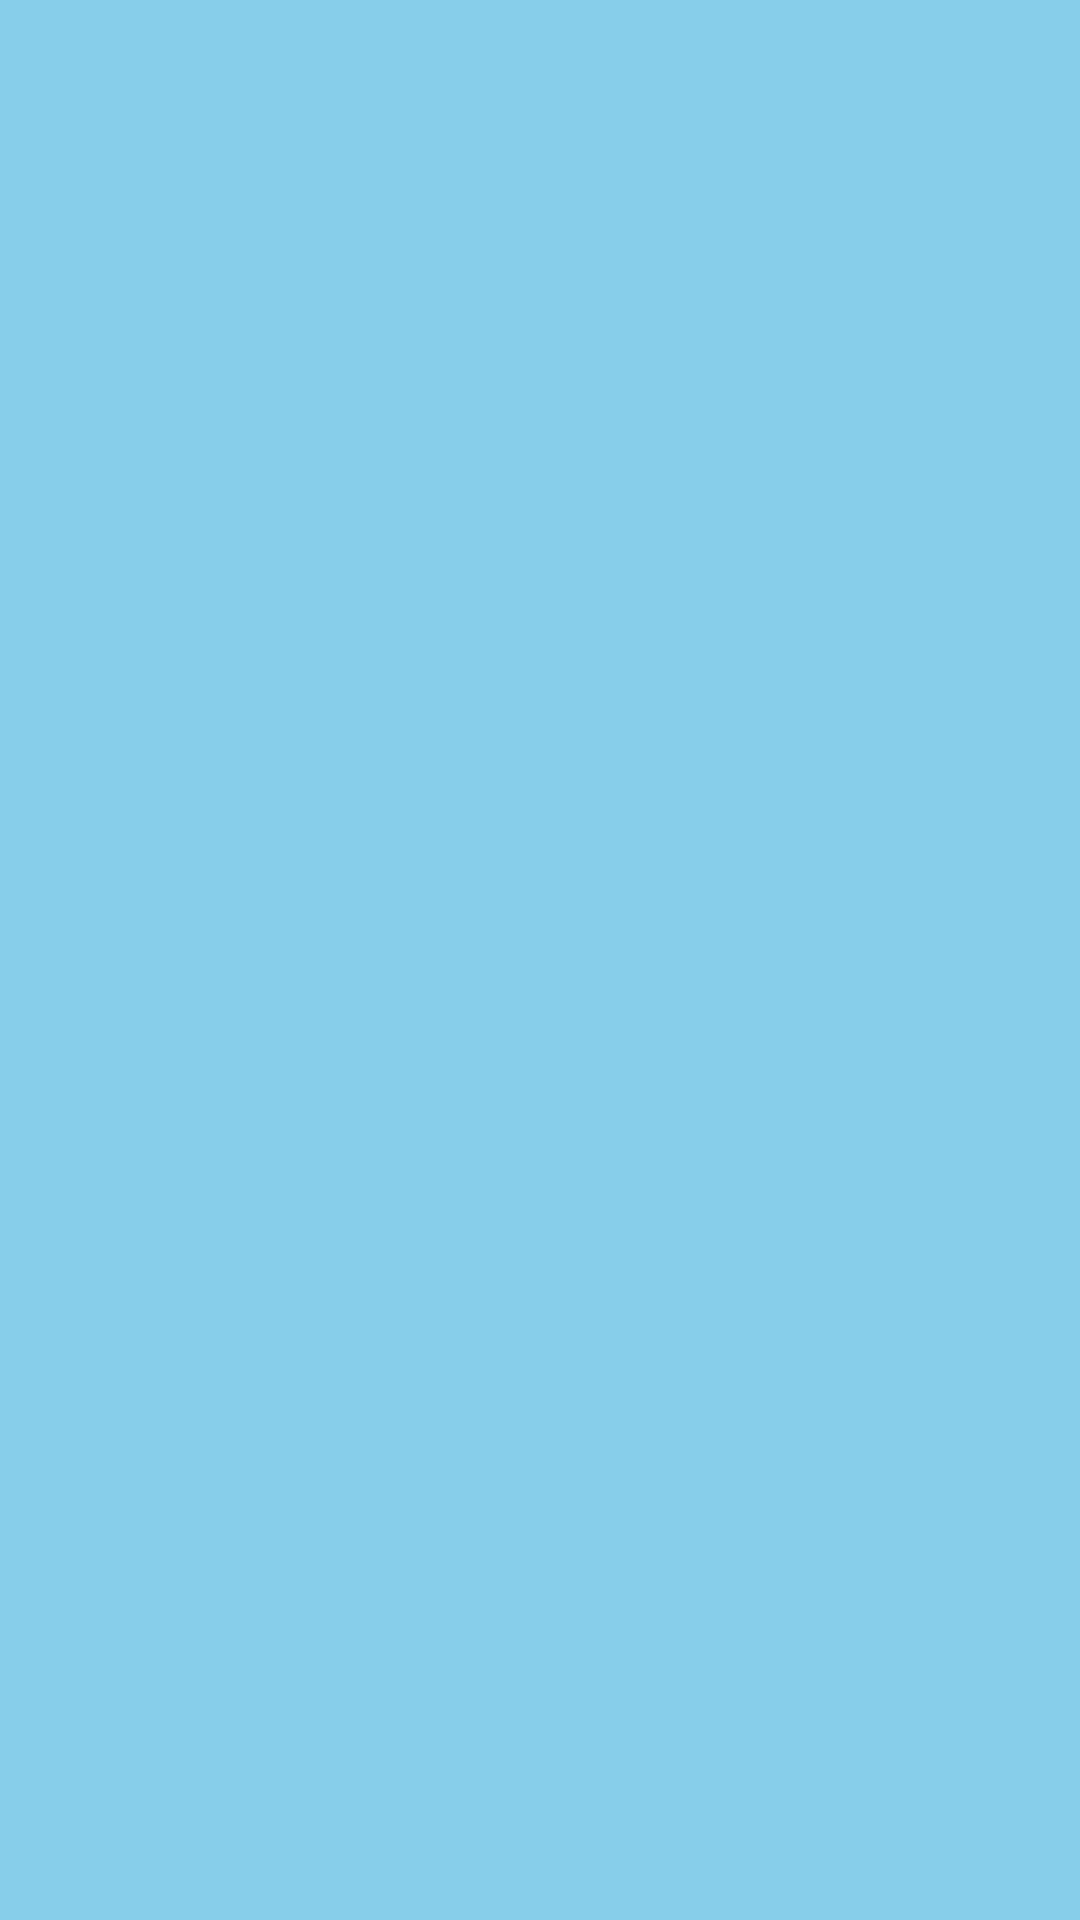 1080x1920 Sky Blue Solid Color Background